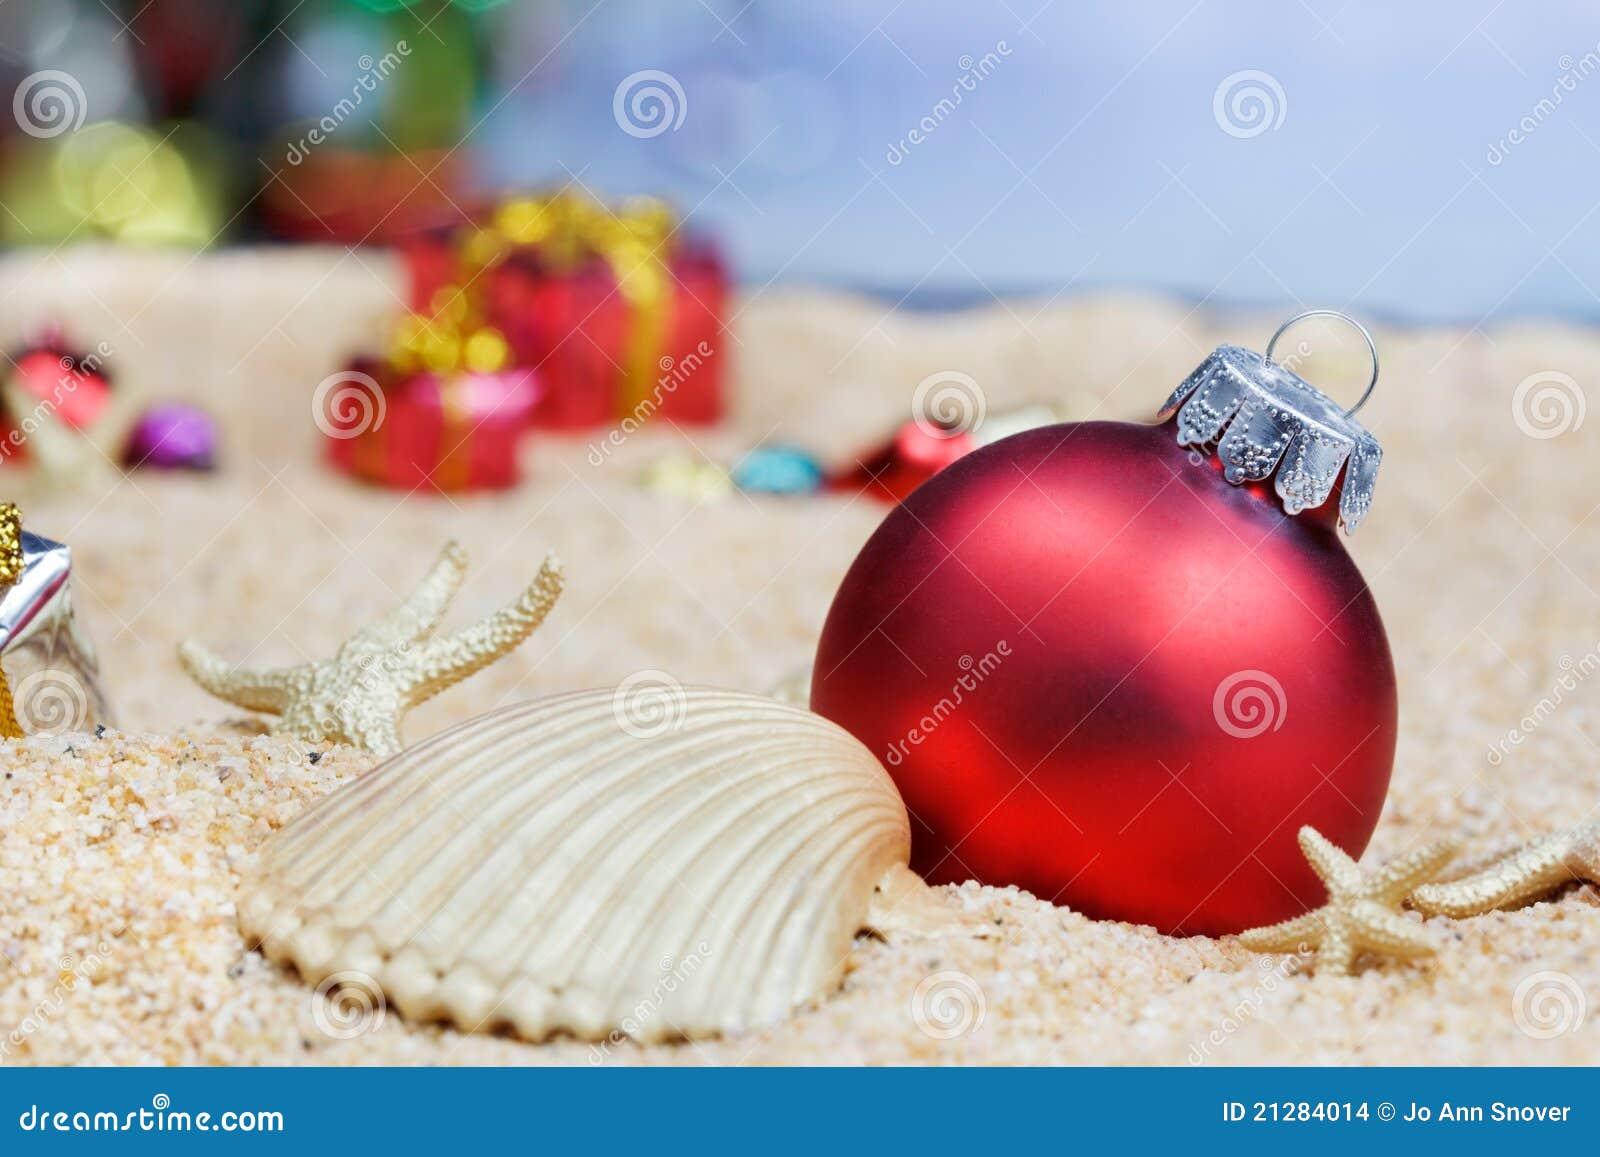 Christmas beach ornaments - Beach Christmas Ornaments Stock Images